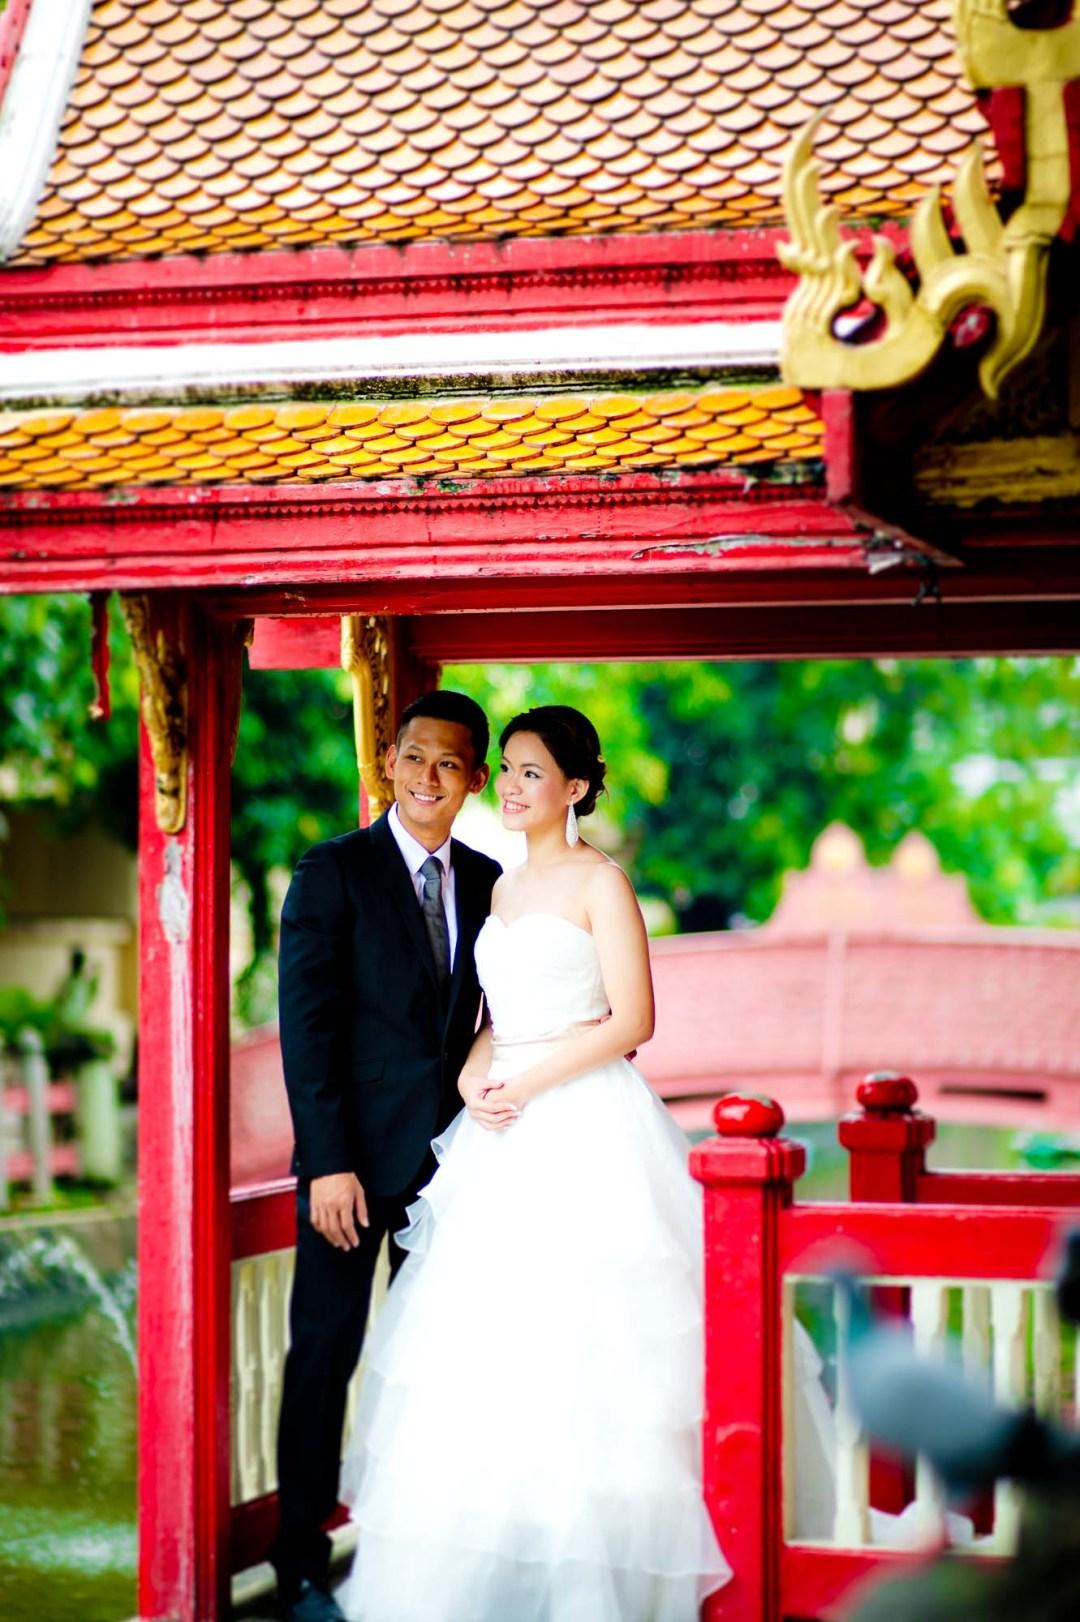 Pre-Wedding at Marble Temple (Wat Benchamabophit) in Bangkok Thailand | Bangkok Wedding Photography